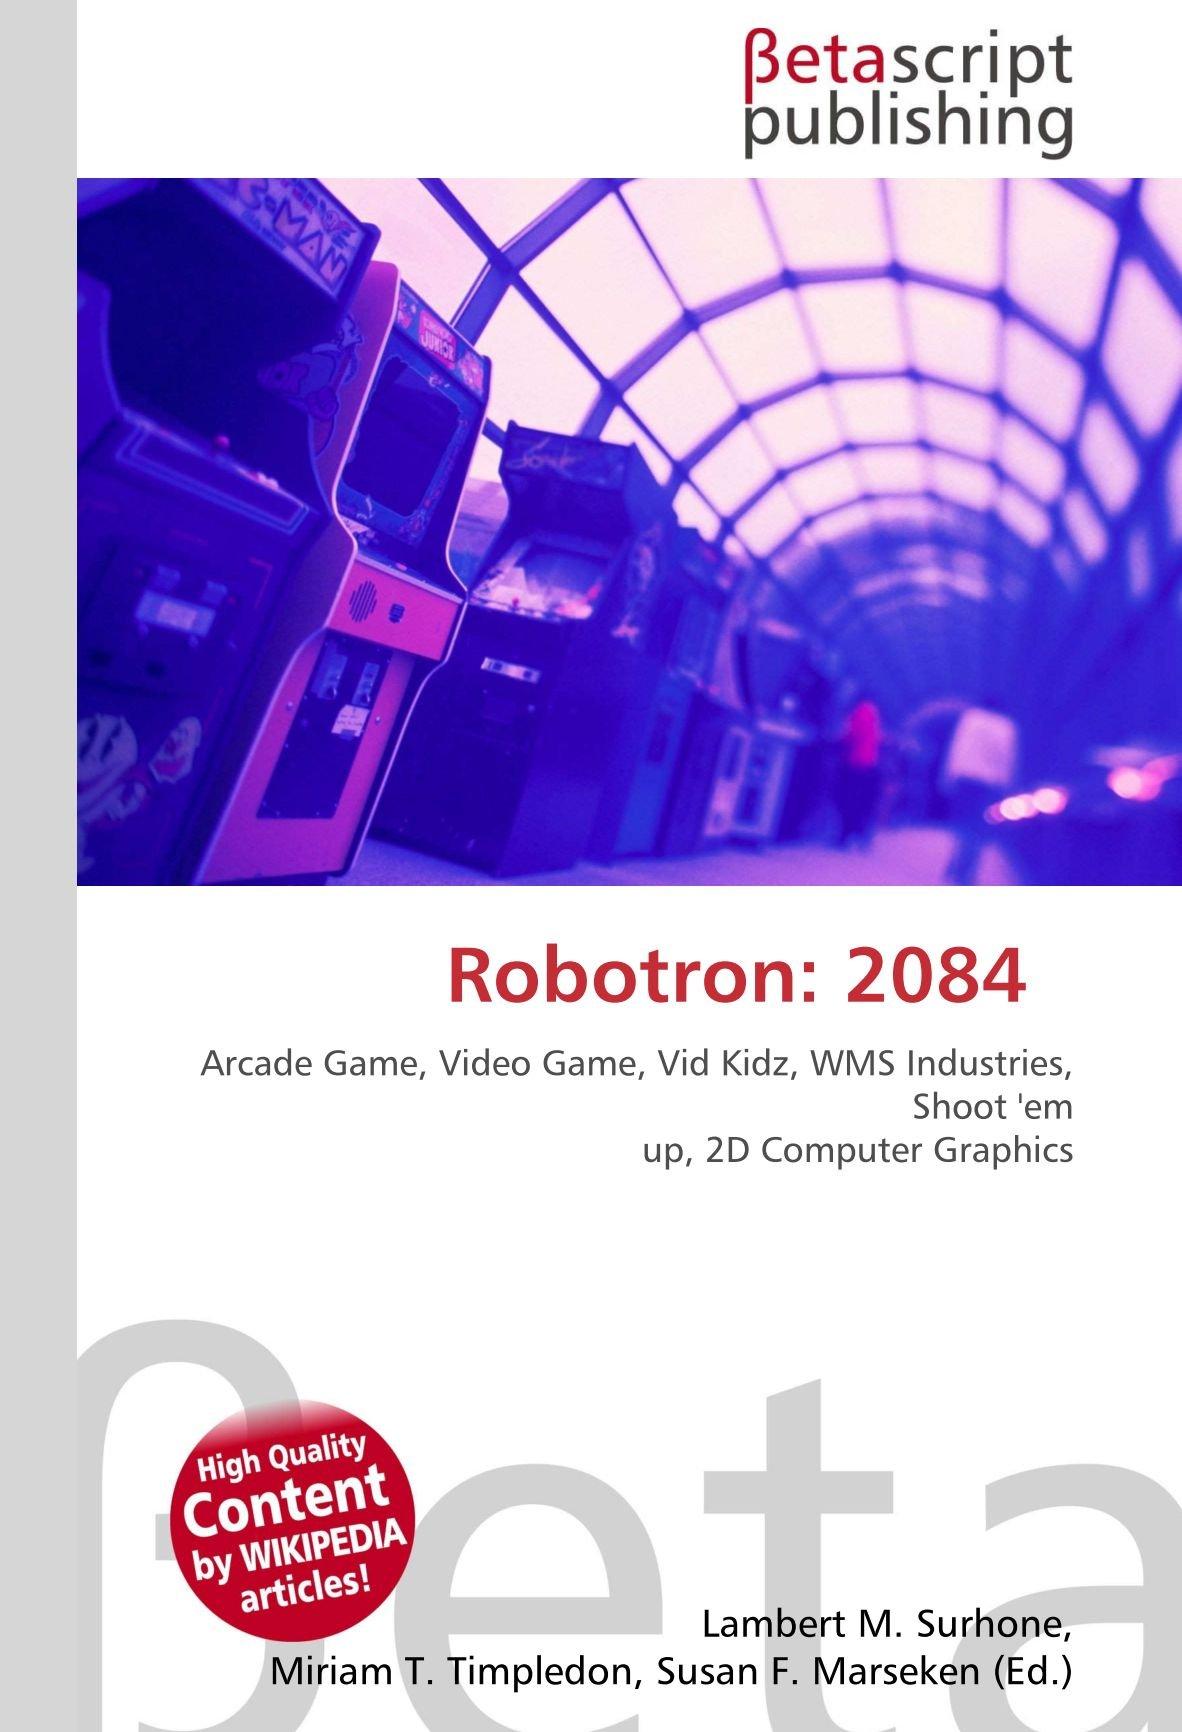 Robotron: 2084 : Arcade Game, Video Game, Vid Kidz, WMS Industries, Shoot em up, 2D Computer Graphics: Amazon.es: Surhone, Lambert M., Timpledon, Miriam T., Marseken, Susan F.: Libros en idiomas extranjeros